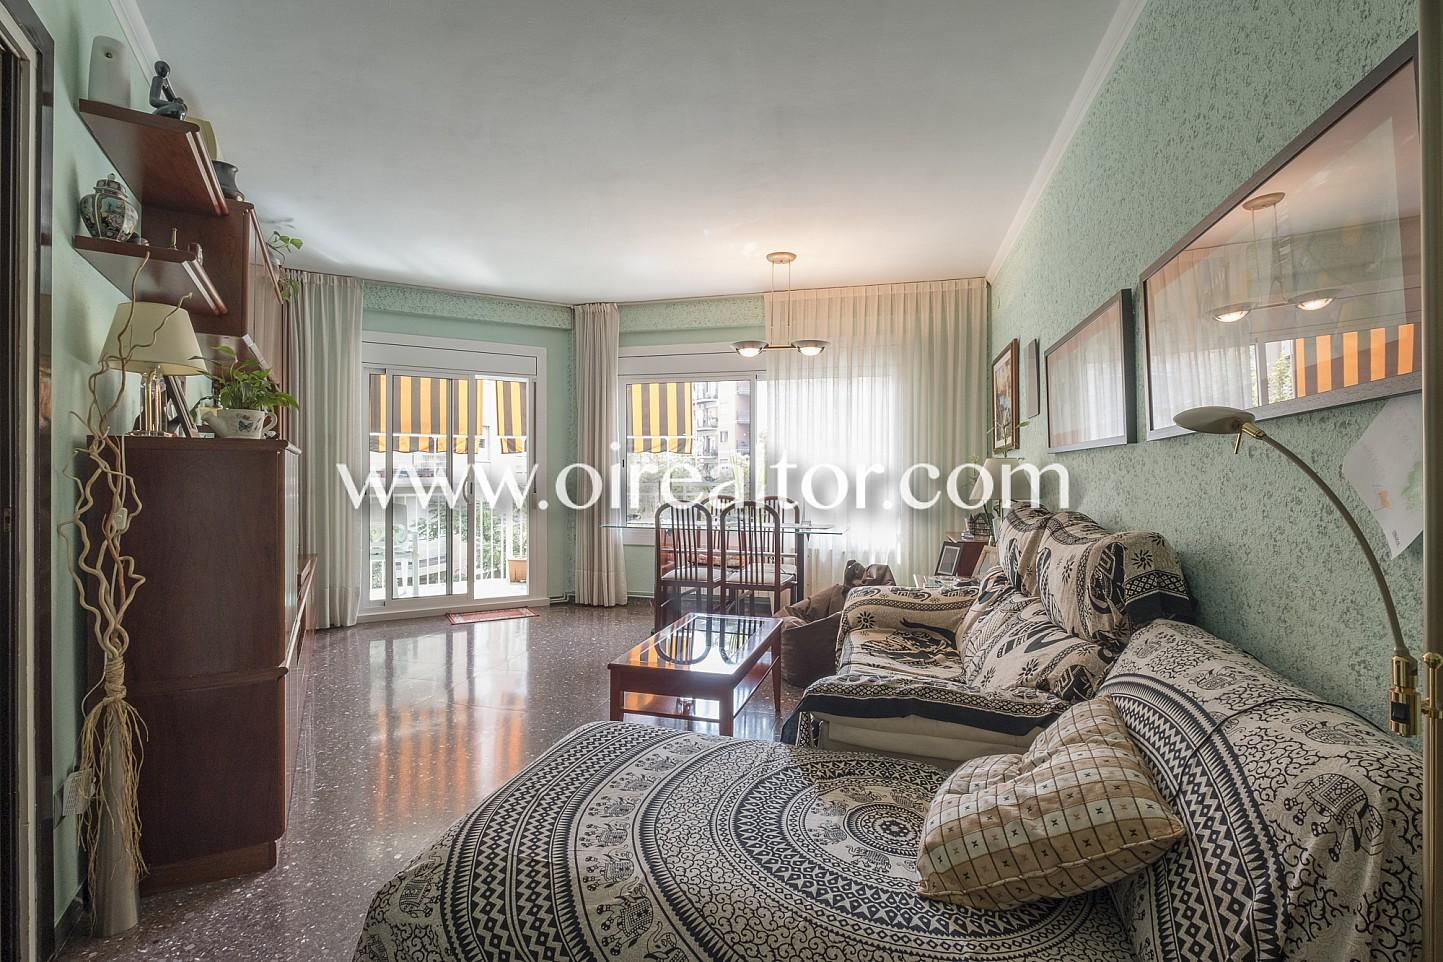 Amplio piso con balc n exterior en sagrada familia - Piso sagrada familia ...